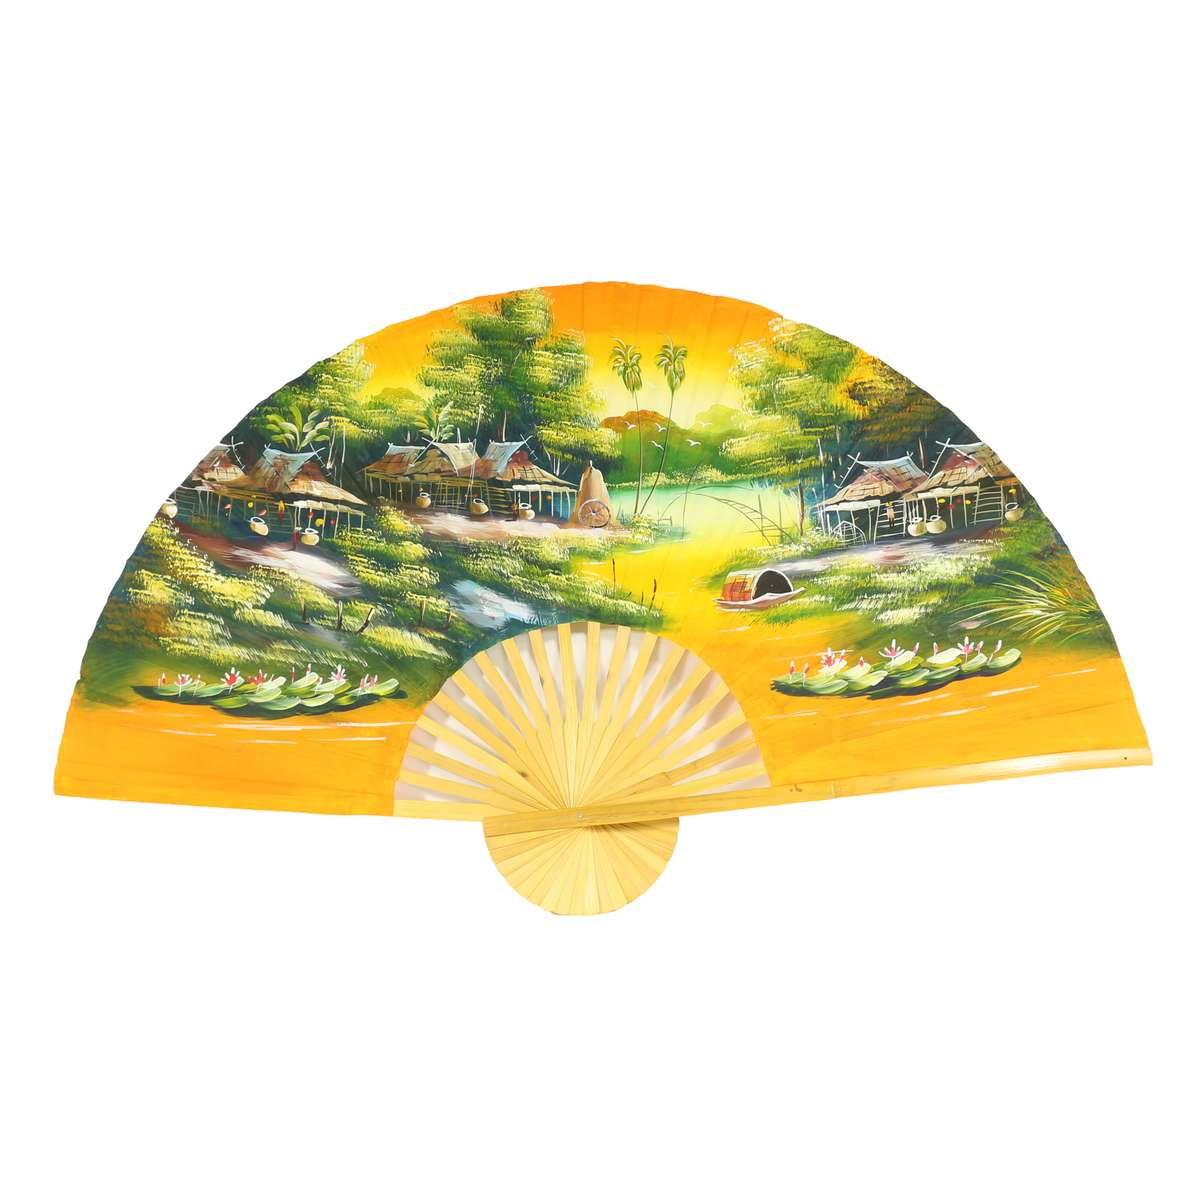 Orangener wandf cher xxl asien thailand handarbeit dekof cher wandbild bambus klappf cher deko - Wanddeko bambus ...